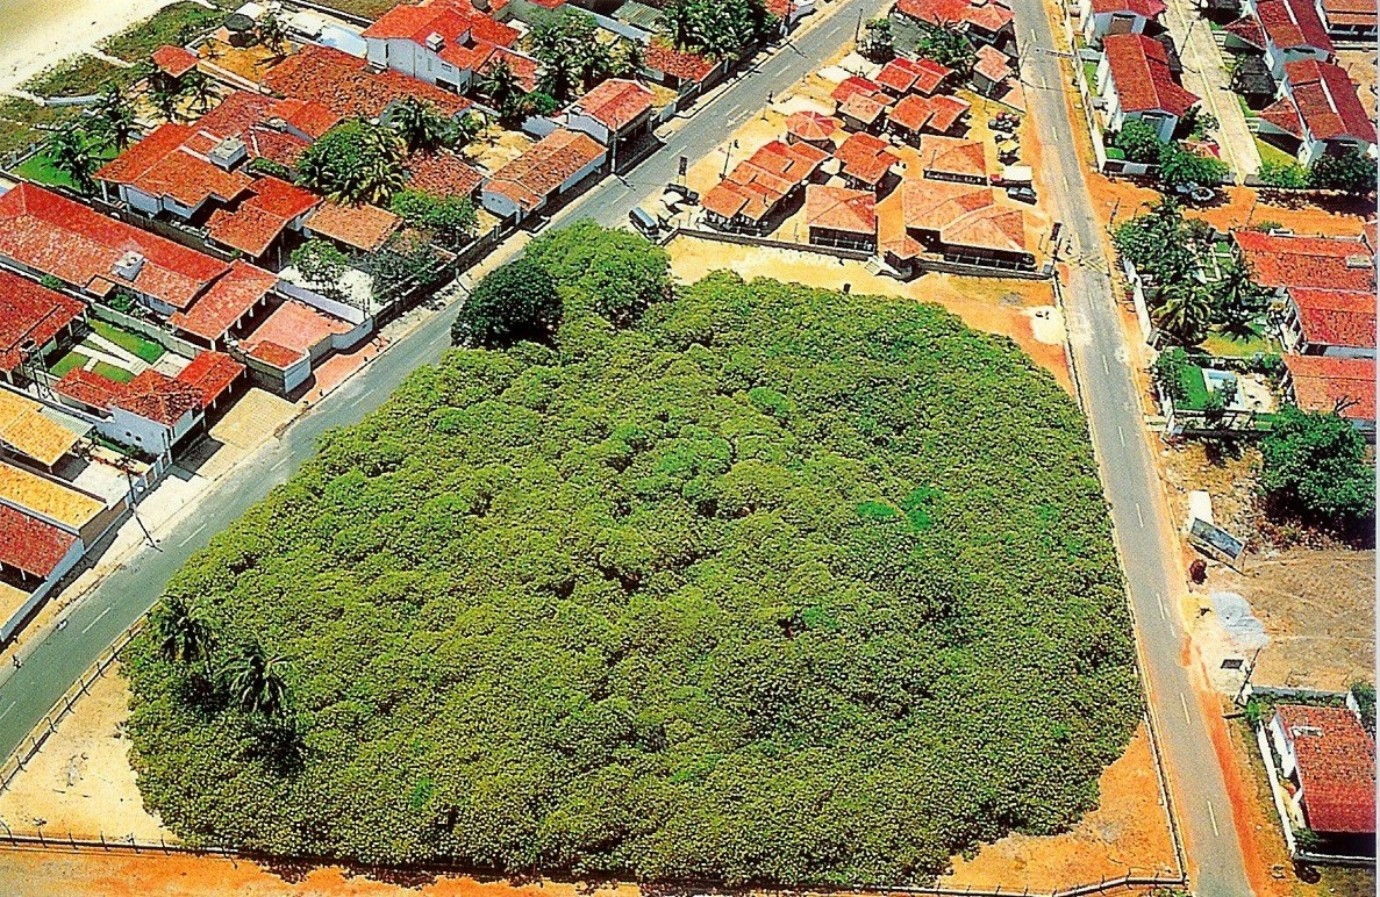 Thousand year old world s largest cashew tree maior cajueiro do